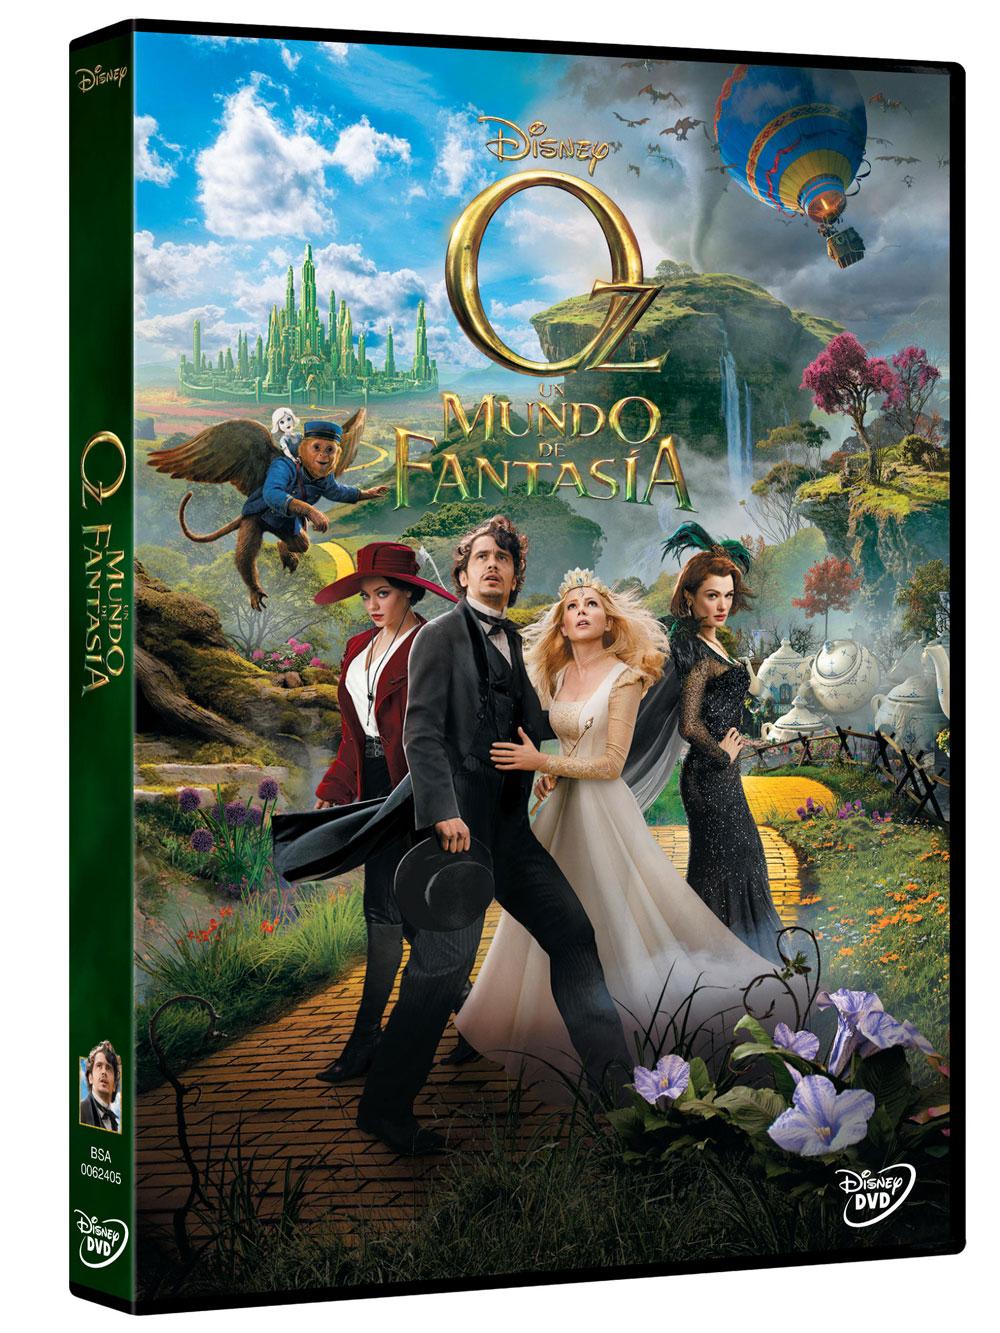 Oz,  Un mundo de fantasía DVD